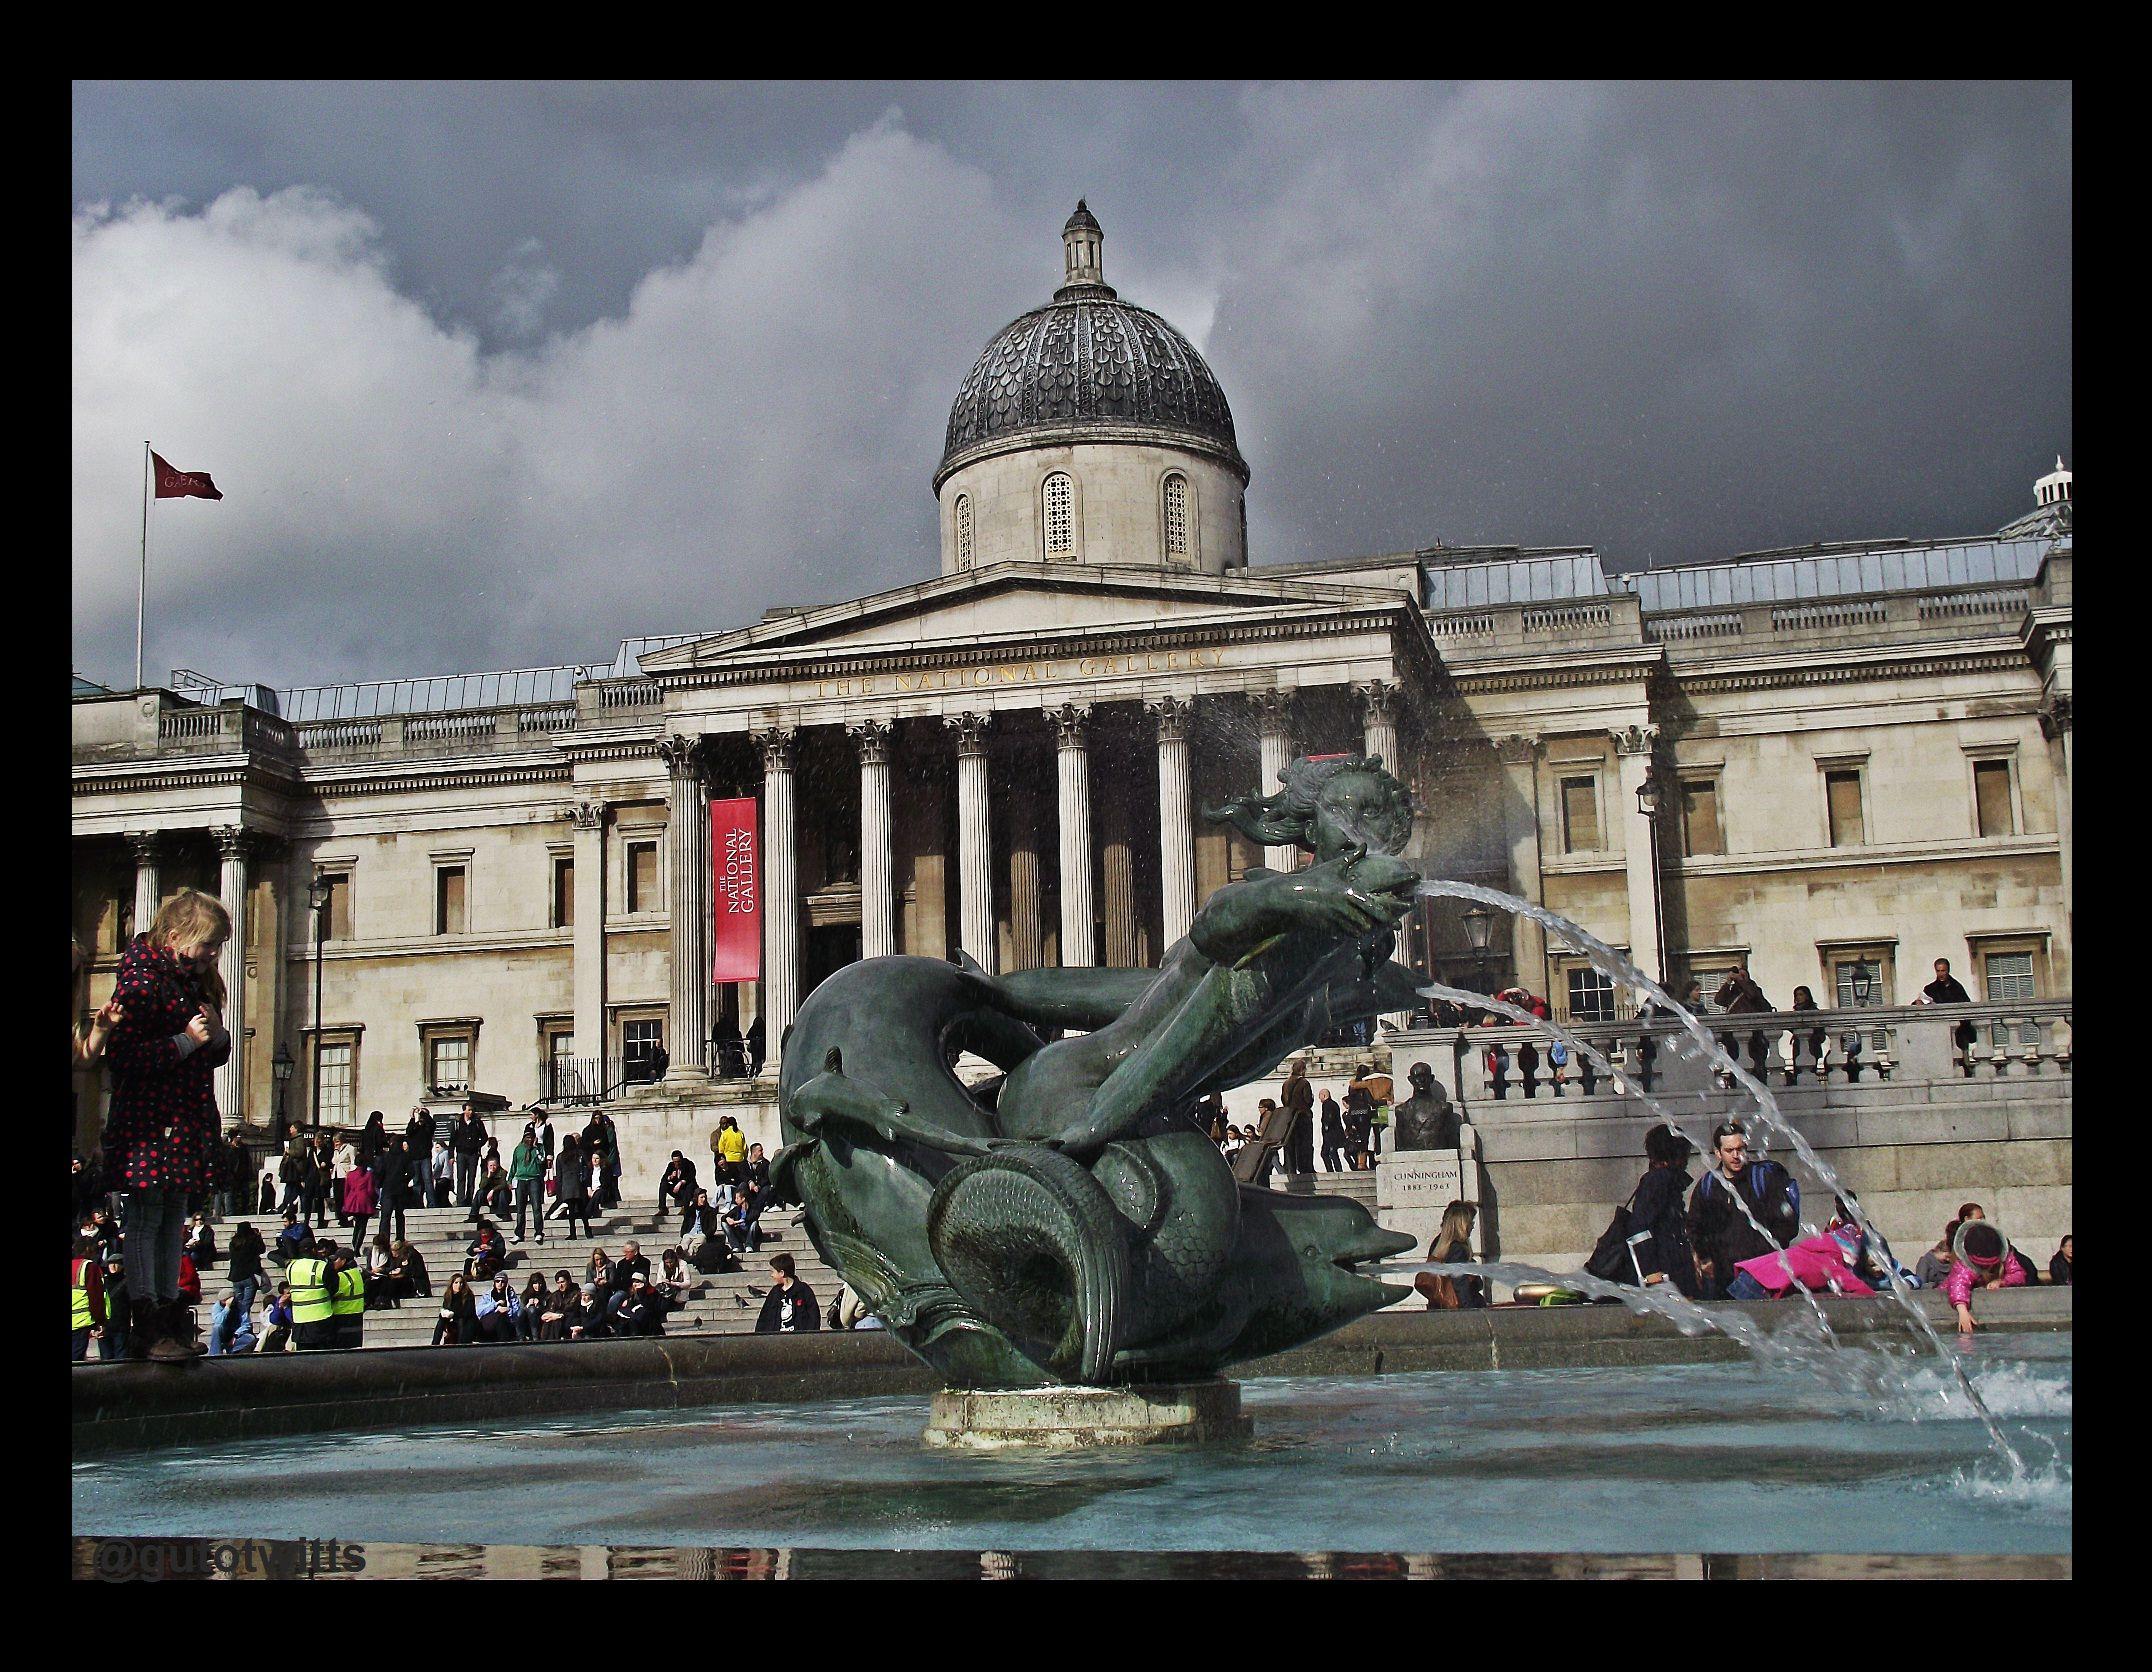 National Gallery - UK